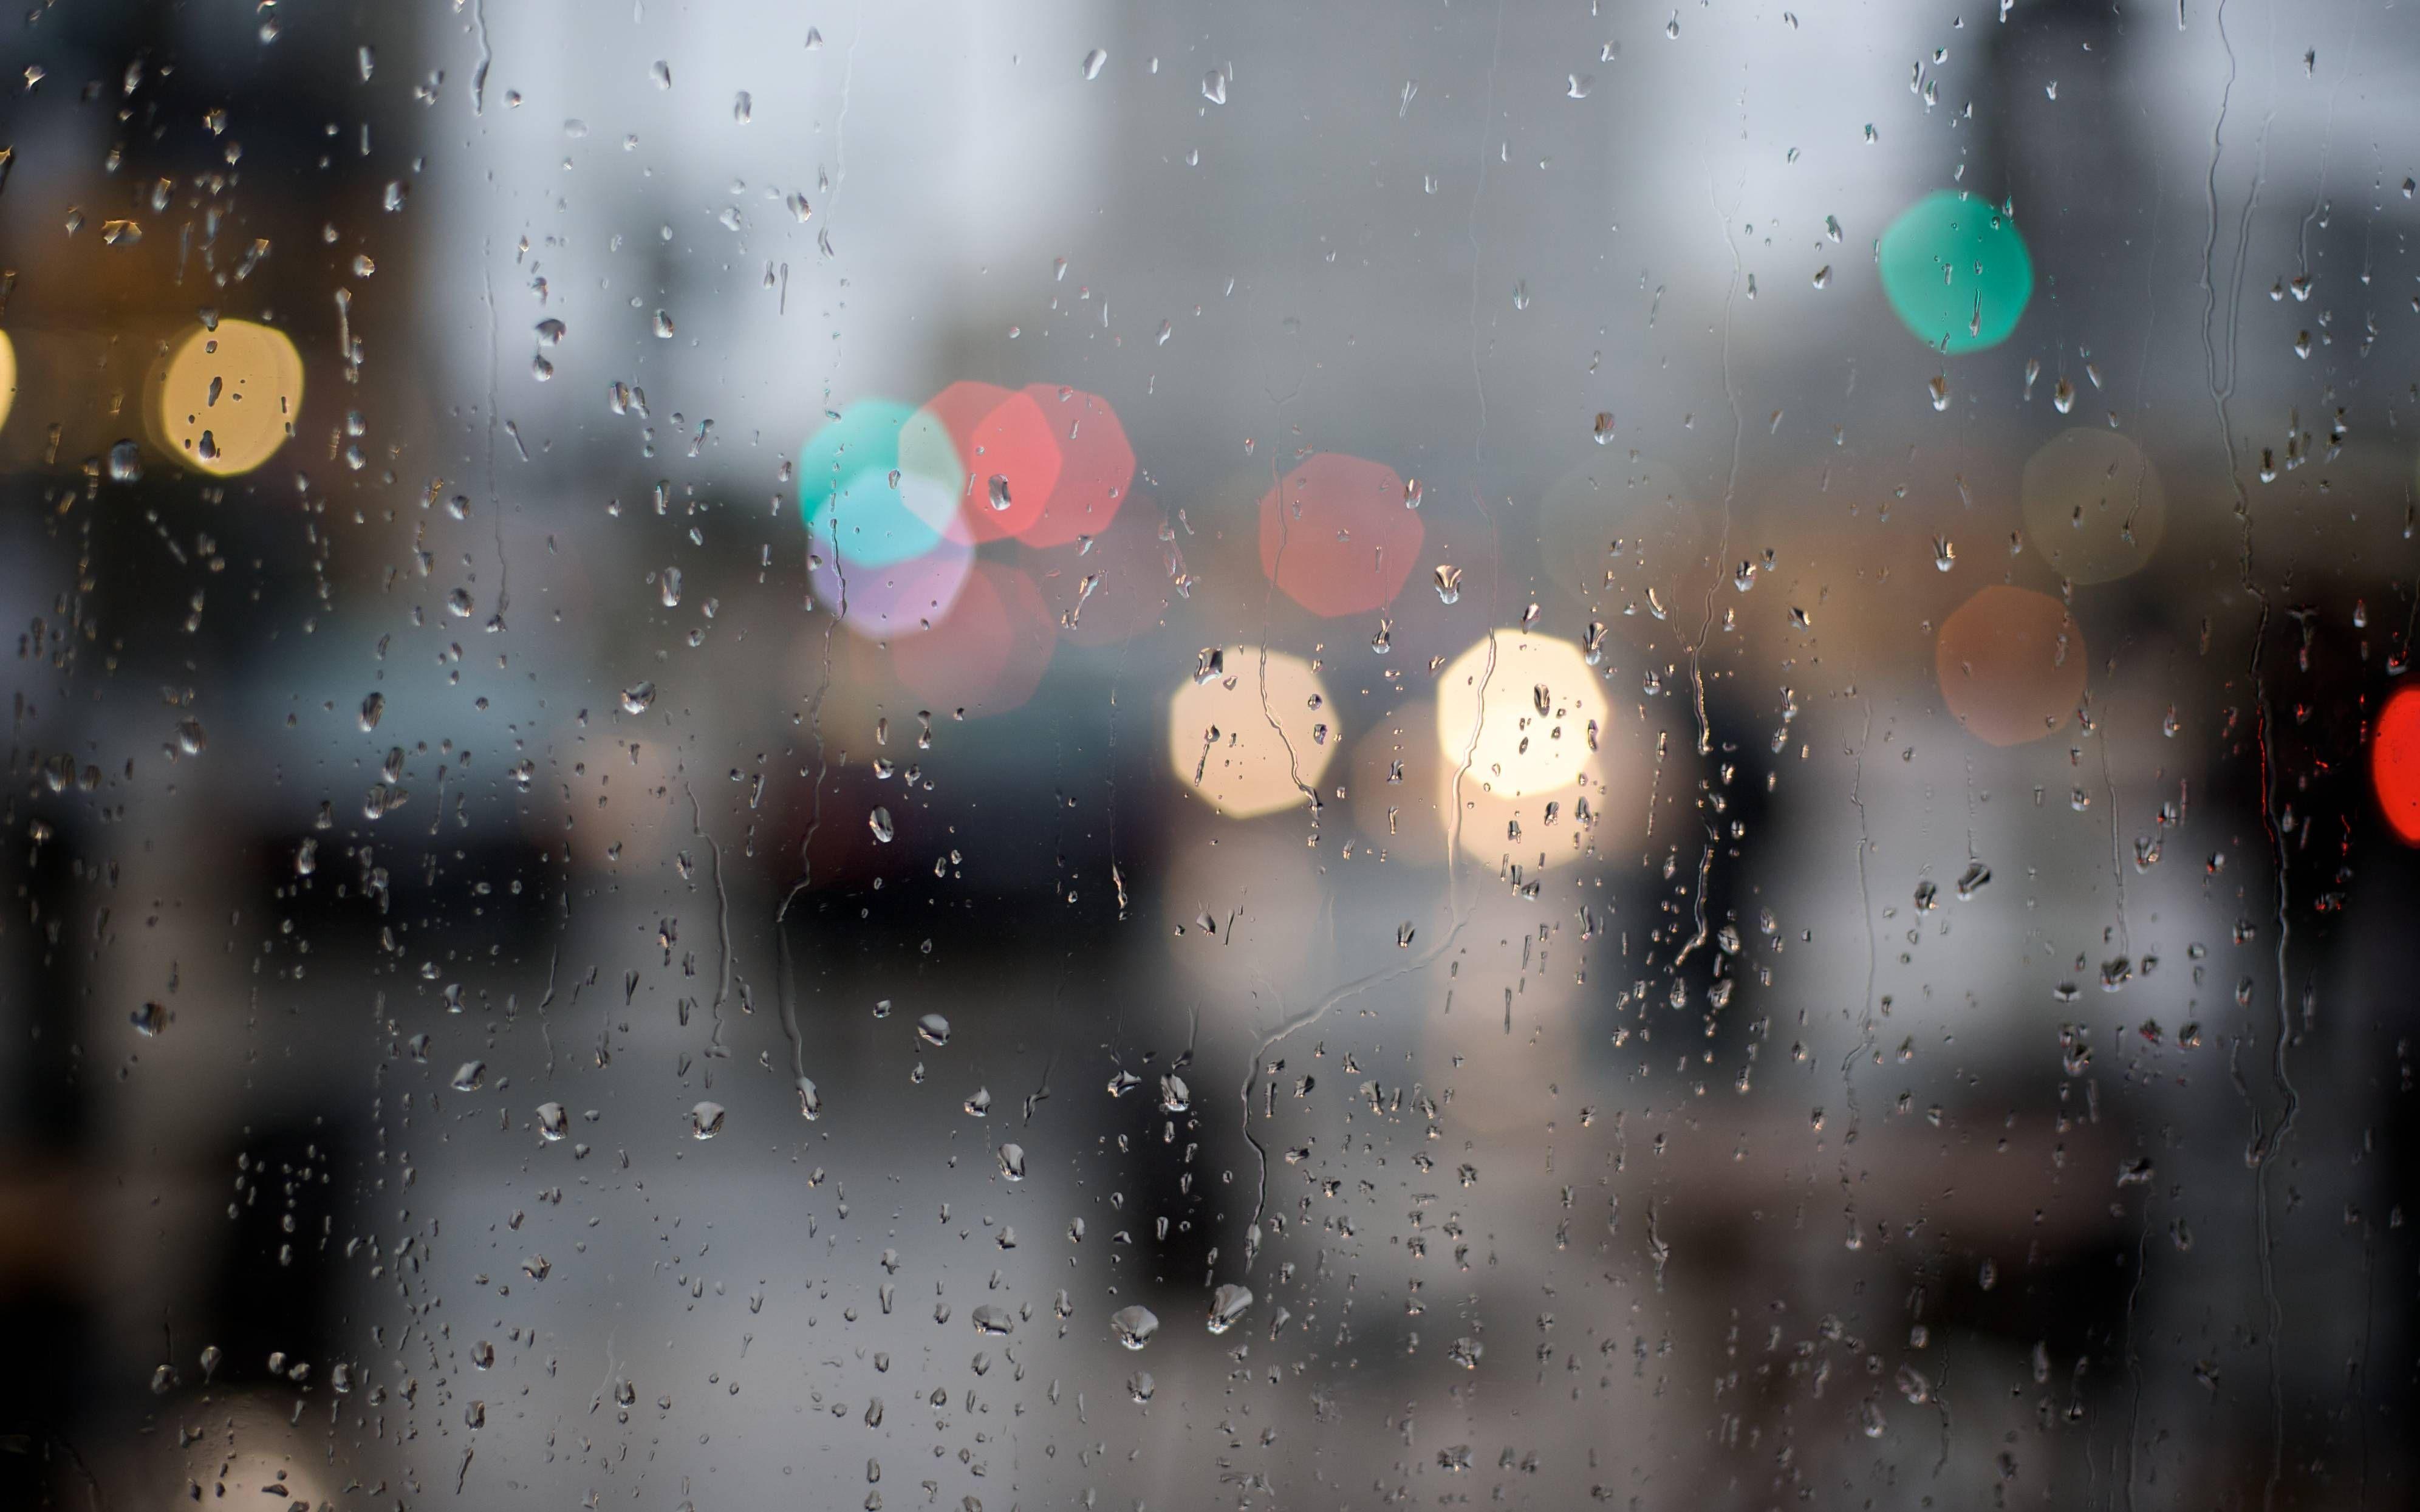 Hd wallpaper rain - Rainy Day Wallpapers Wallpaper